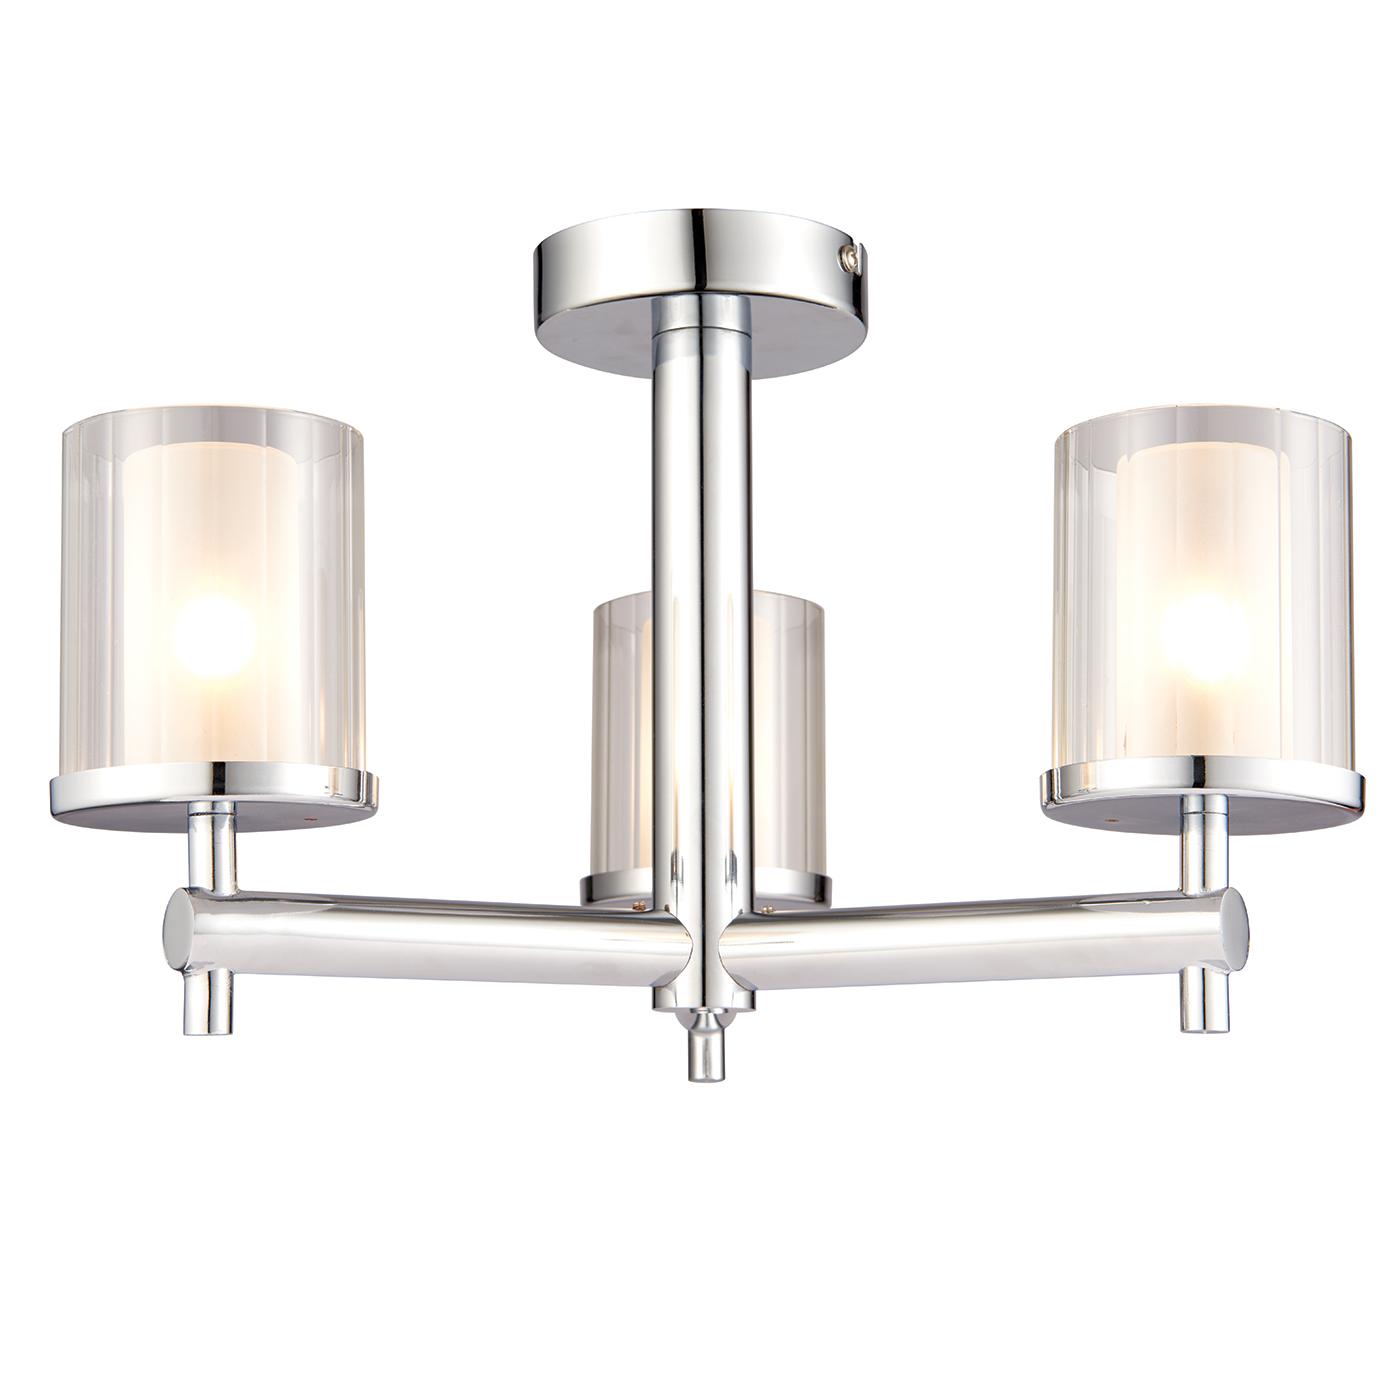 Endon Bathroom Ceiling Lights endon britton semi flush bathroom ceiling light ip44 3x 18w chrome